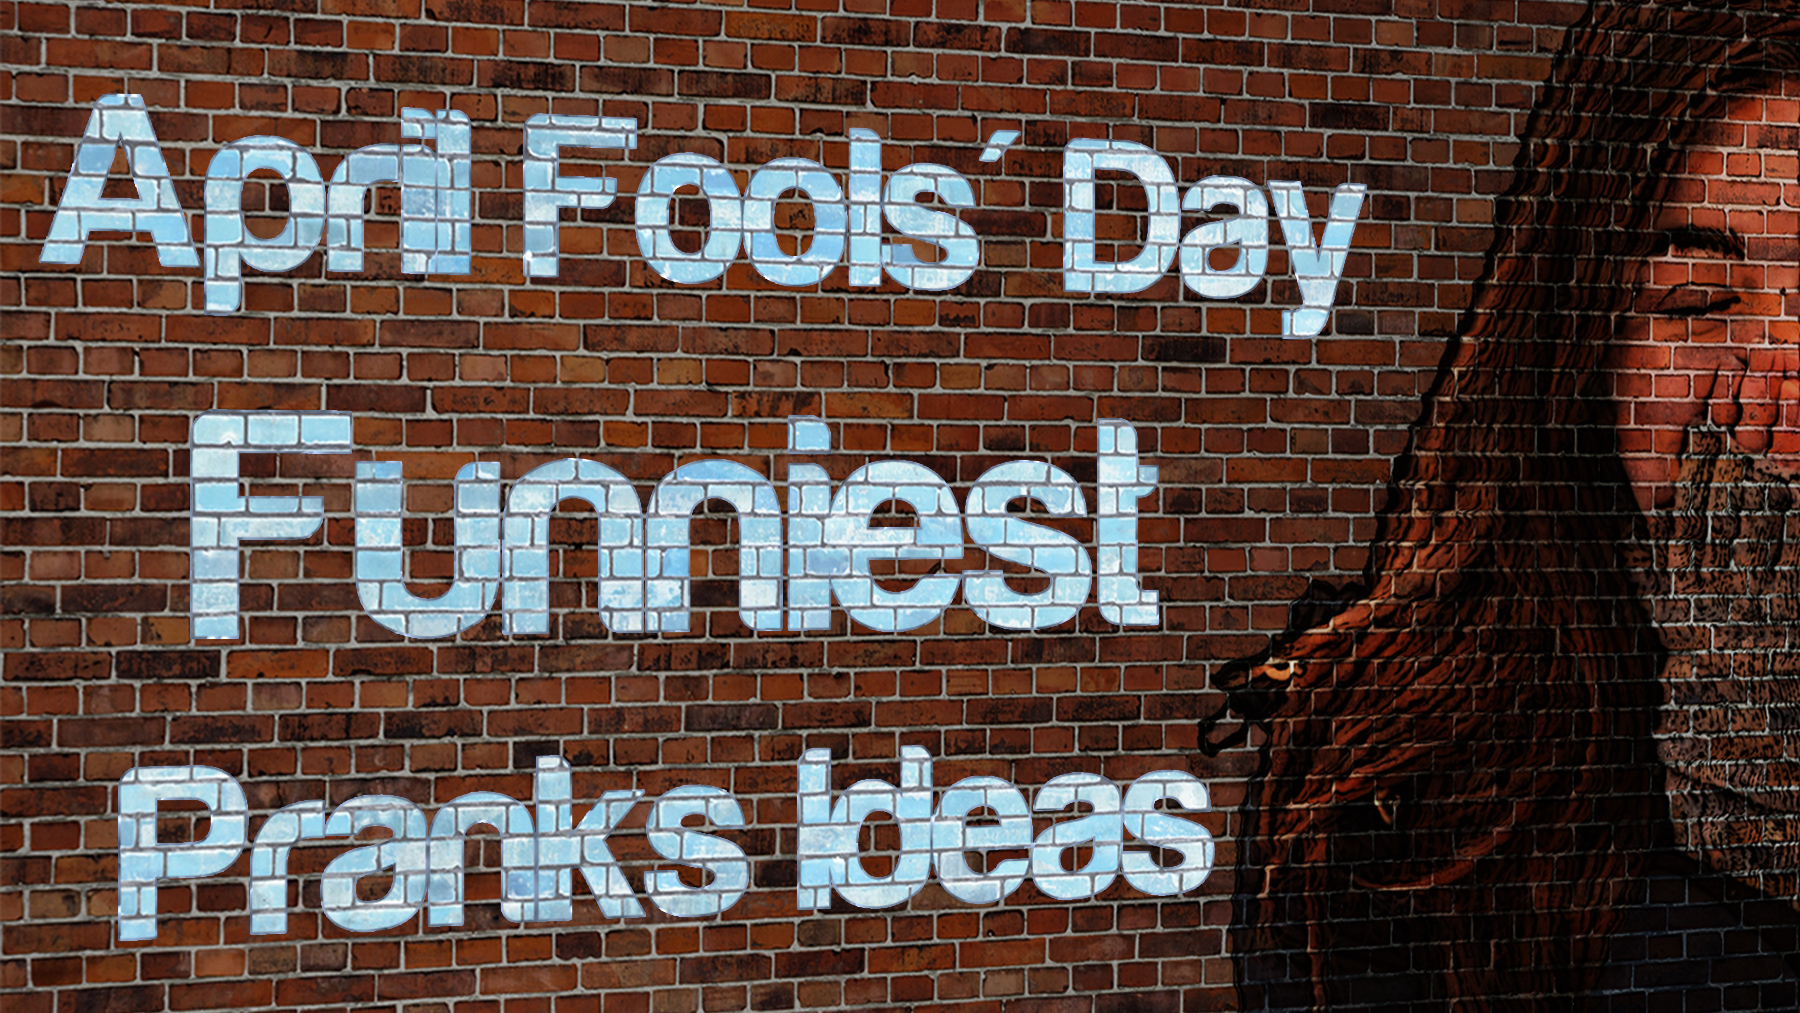 April Fools Day Funniest Pranks Ideas Prankster Easy Funny